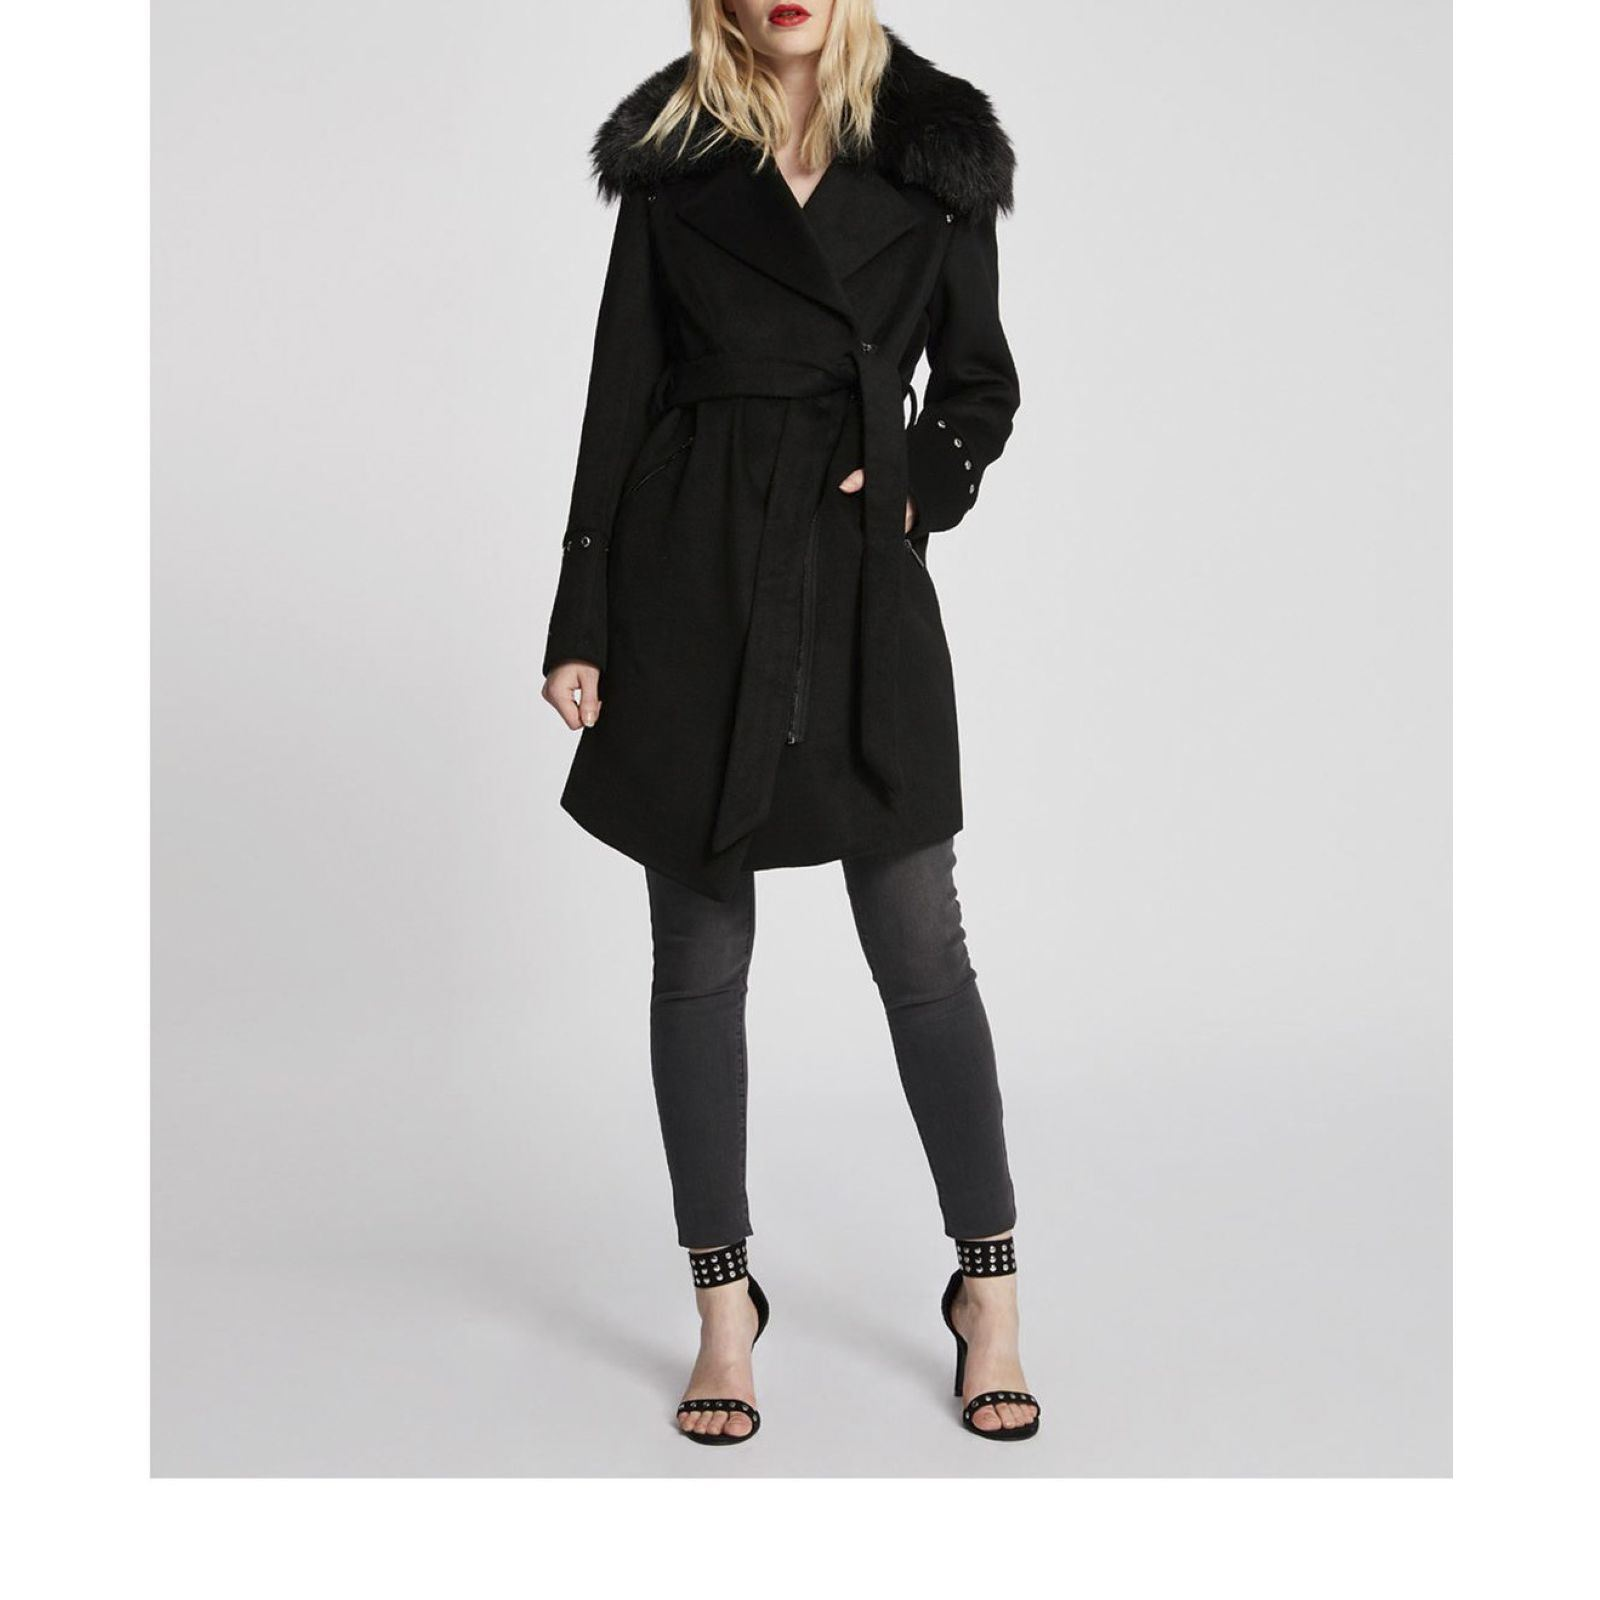 Mujer Collar Coat Frak Fur Morgan Negro Faux CBdeorx